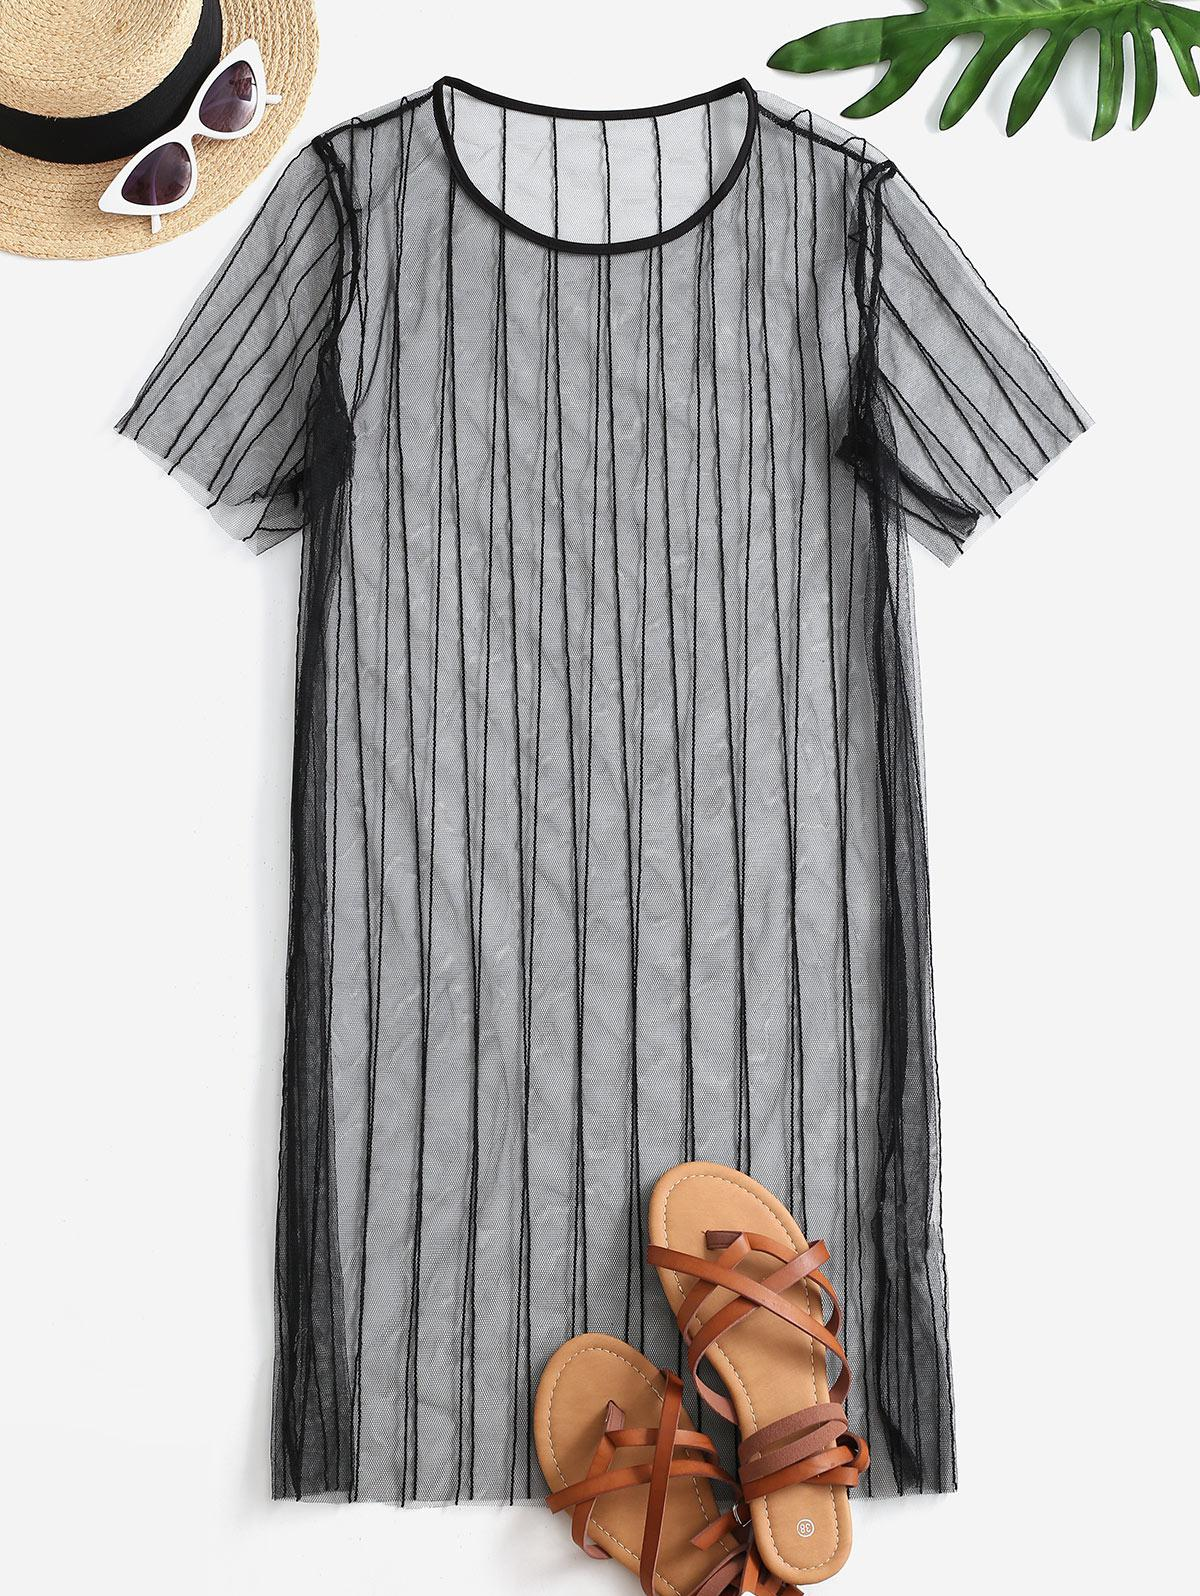 See Thru Mesh Cover-up Dress